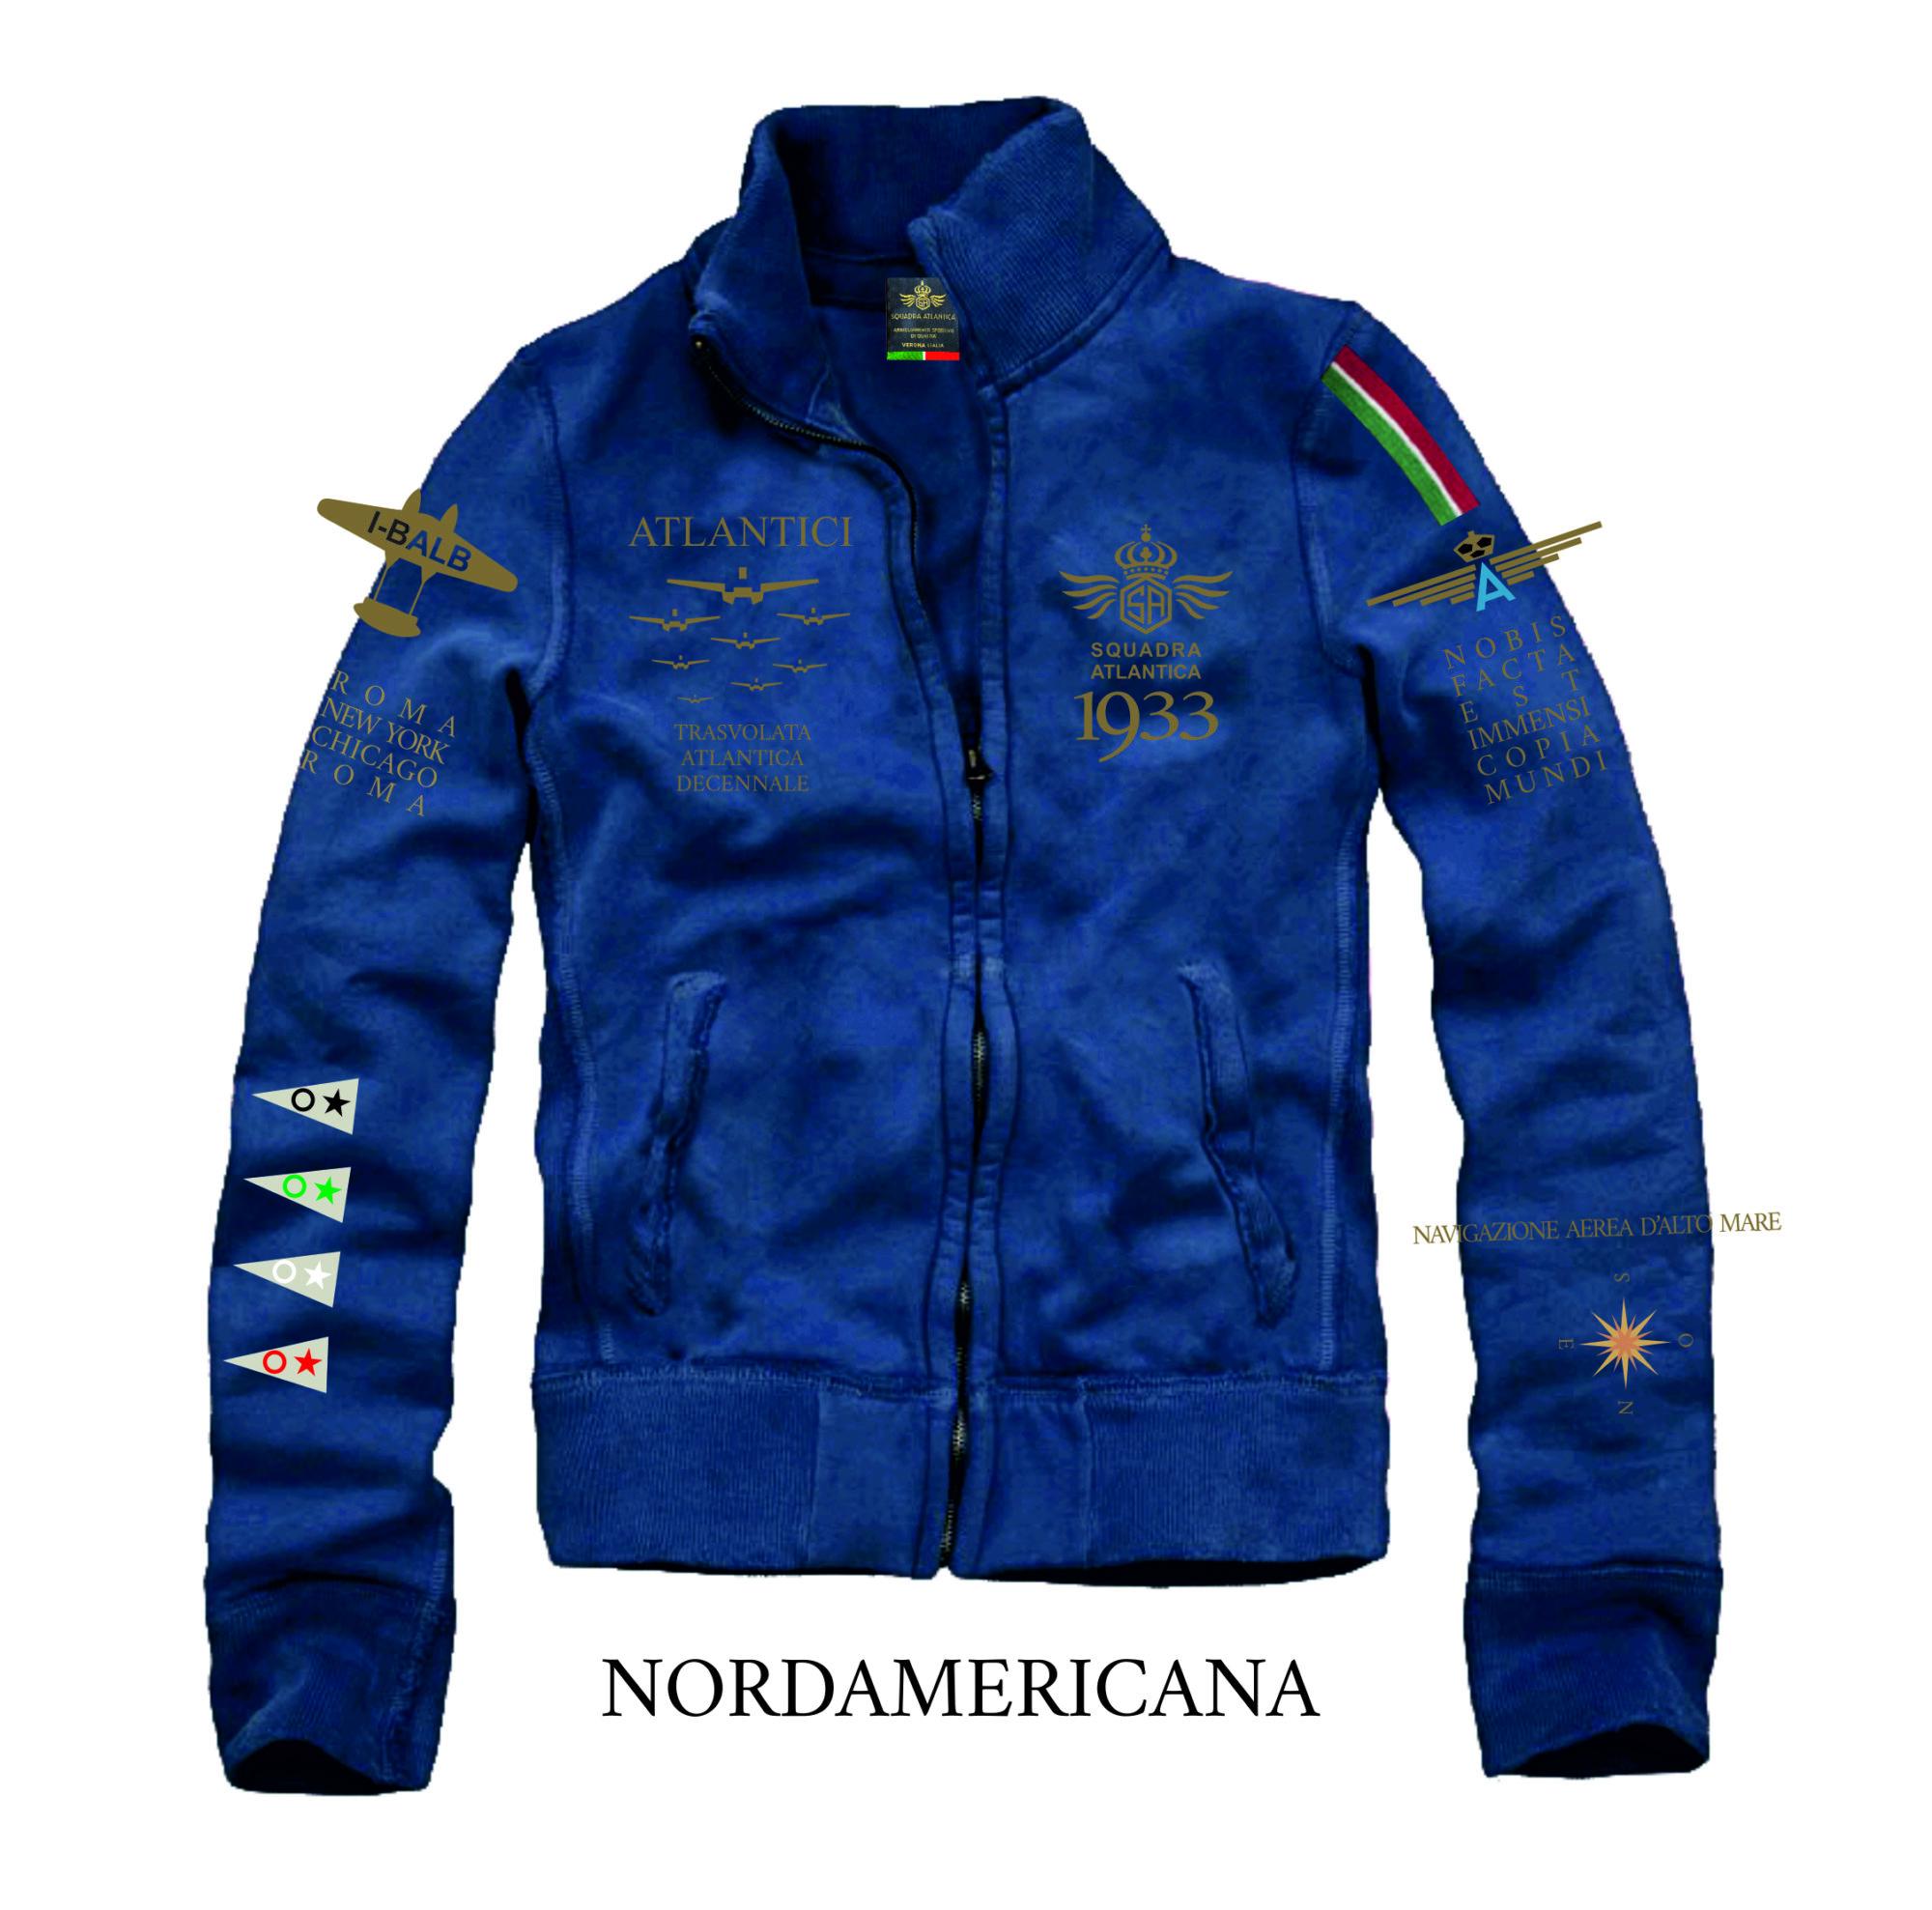 NORDAMERICANA Squadratlantica